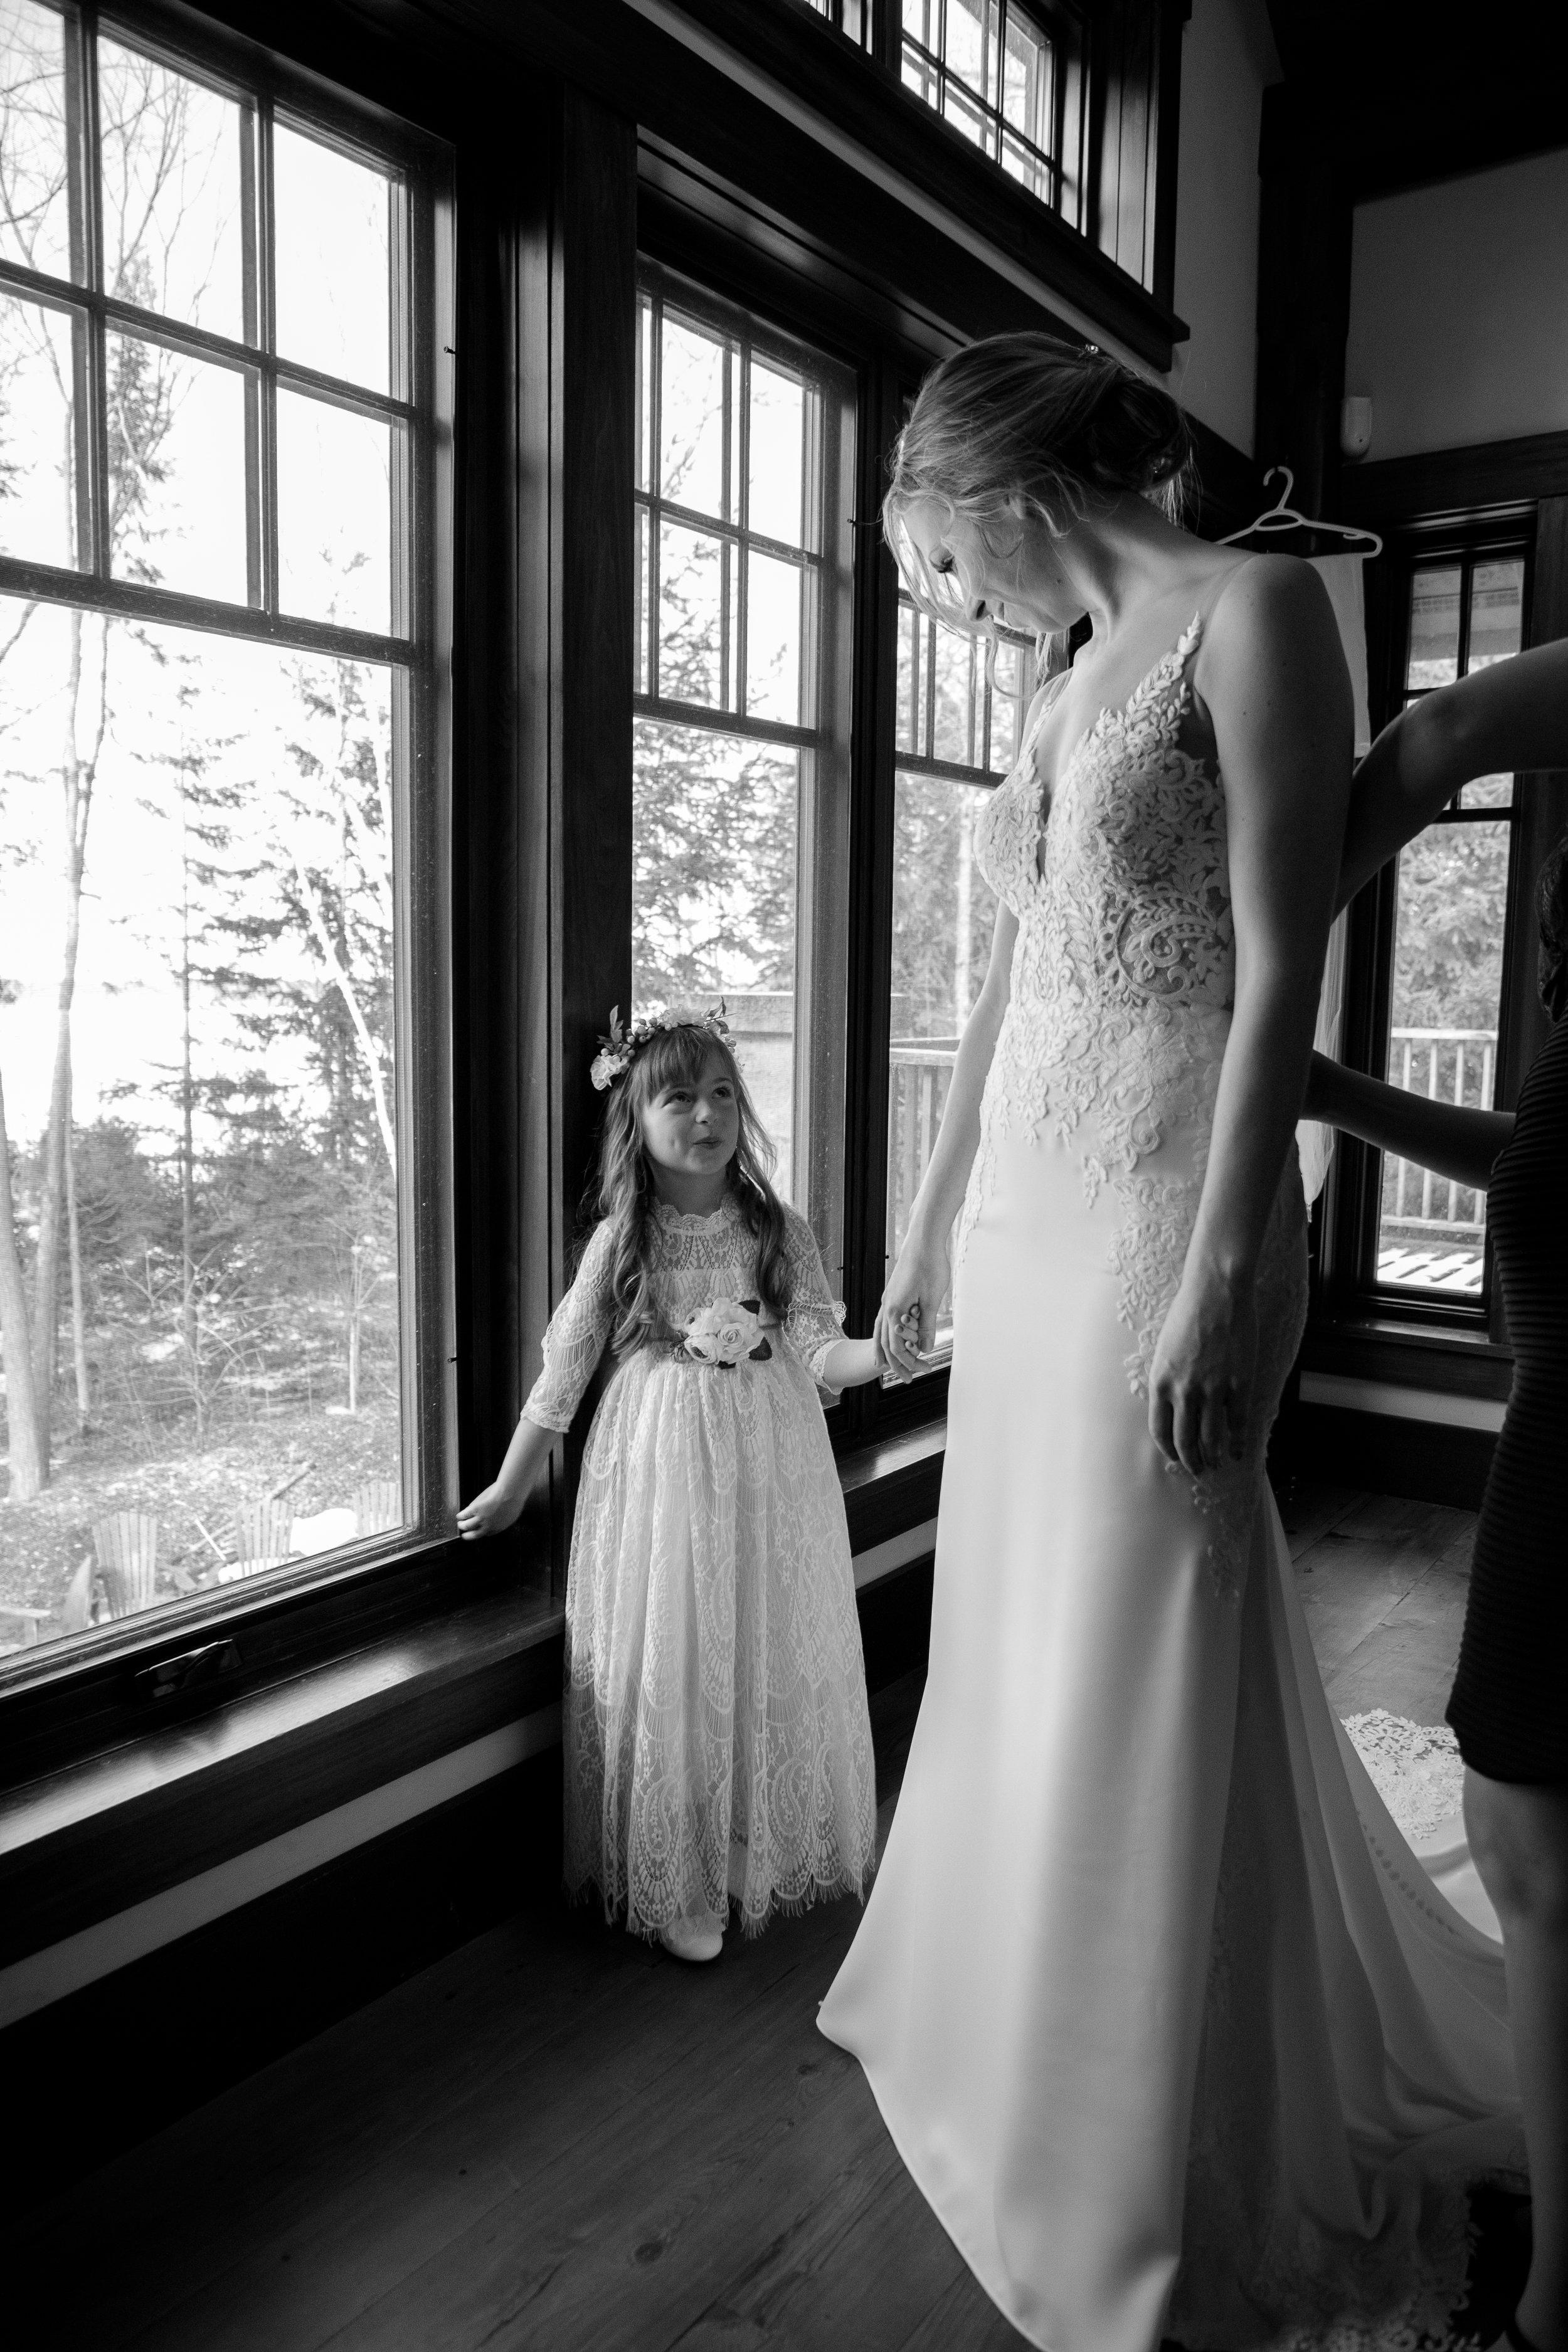 The-Griffiths-Wedding-10-03-10-32.jpg